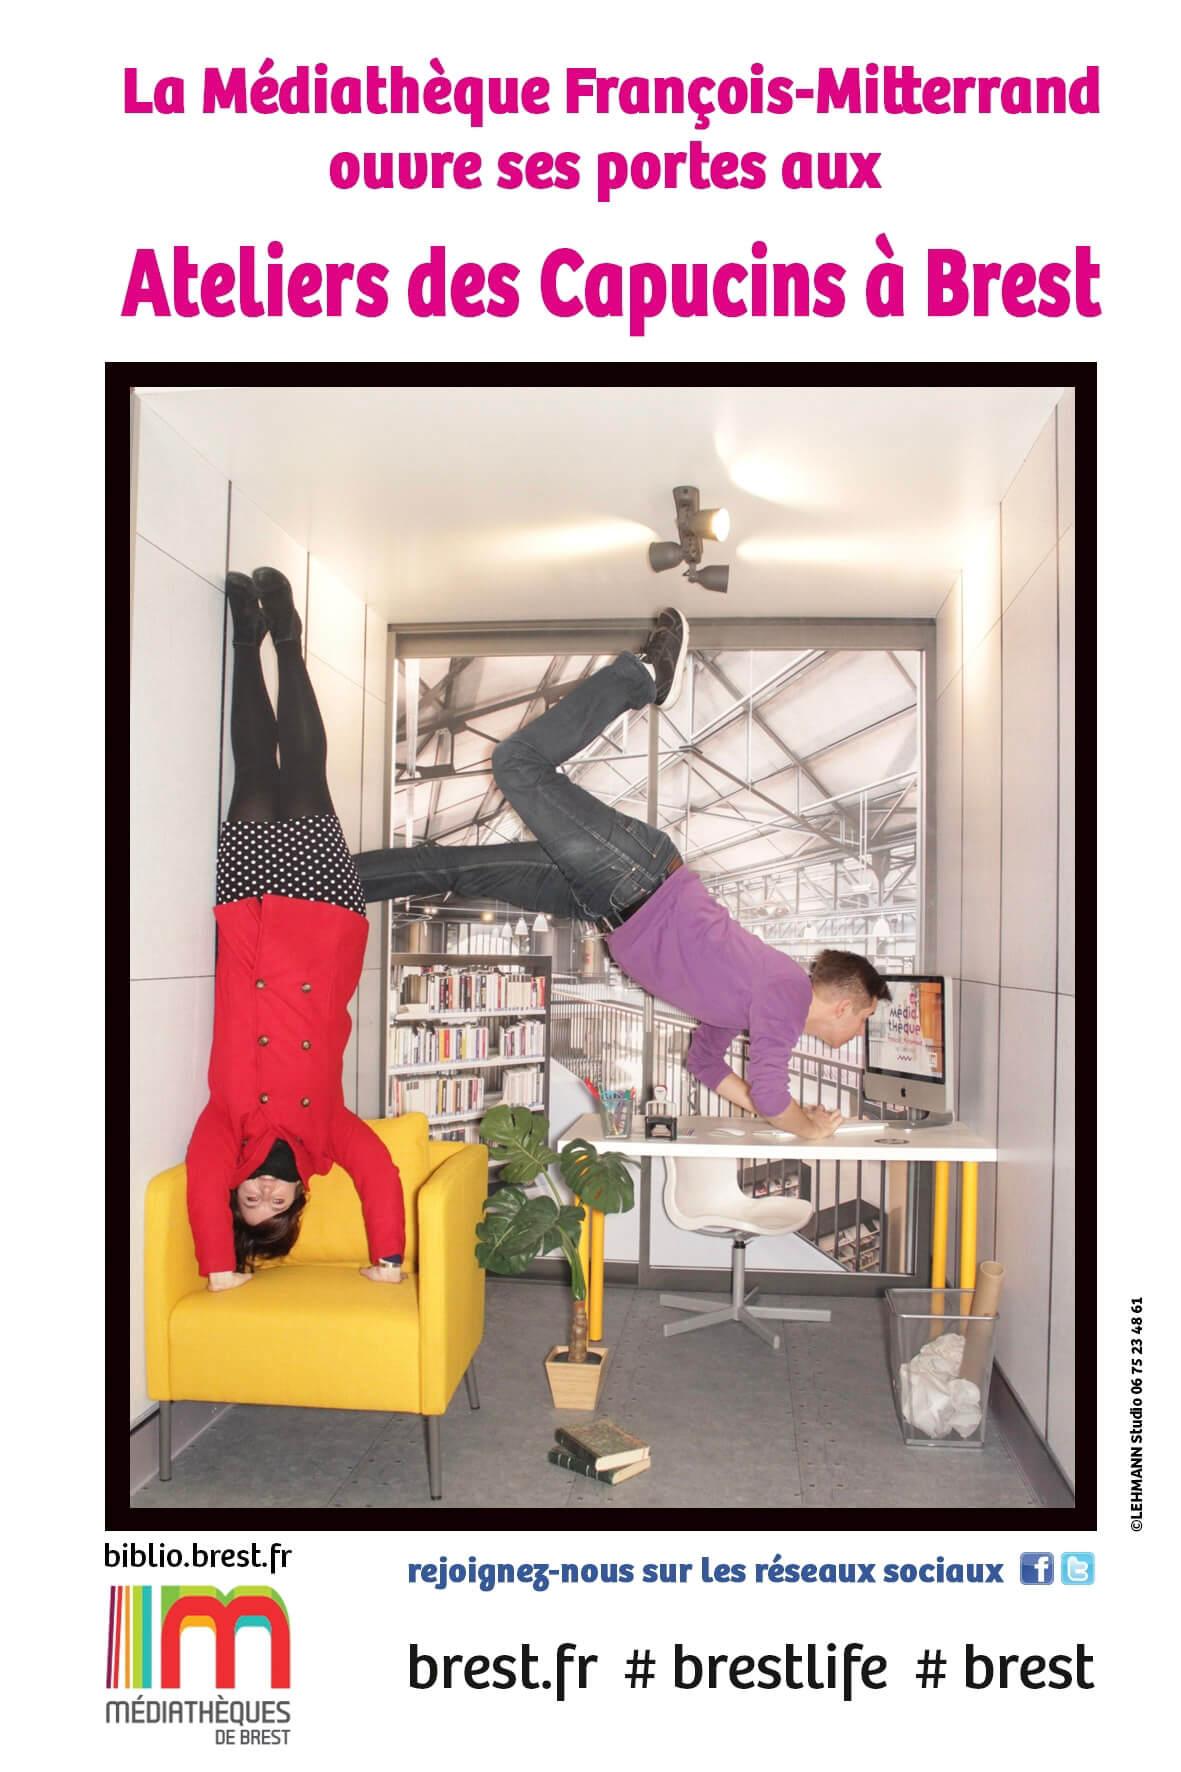 lehman-studio-photographe-angers-evenementiel-gravitybox-ambiance-bureau-mediatheque-capucins-brest